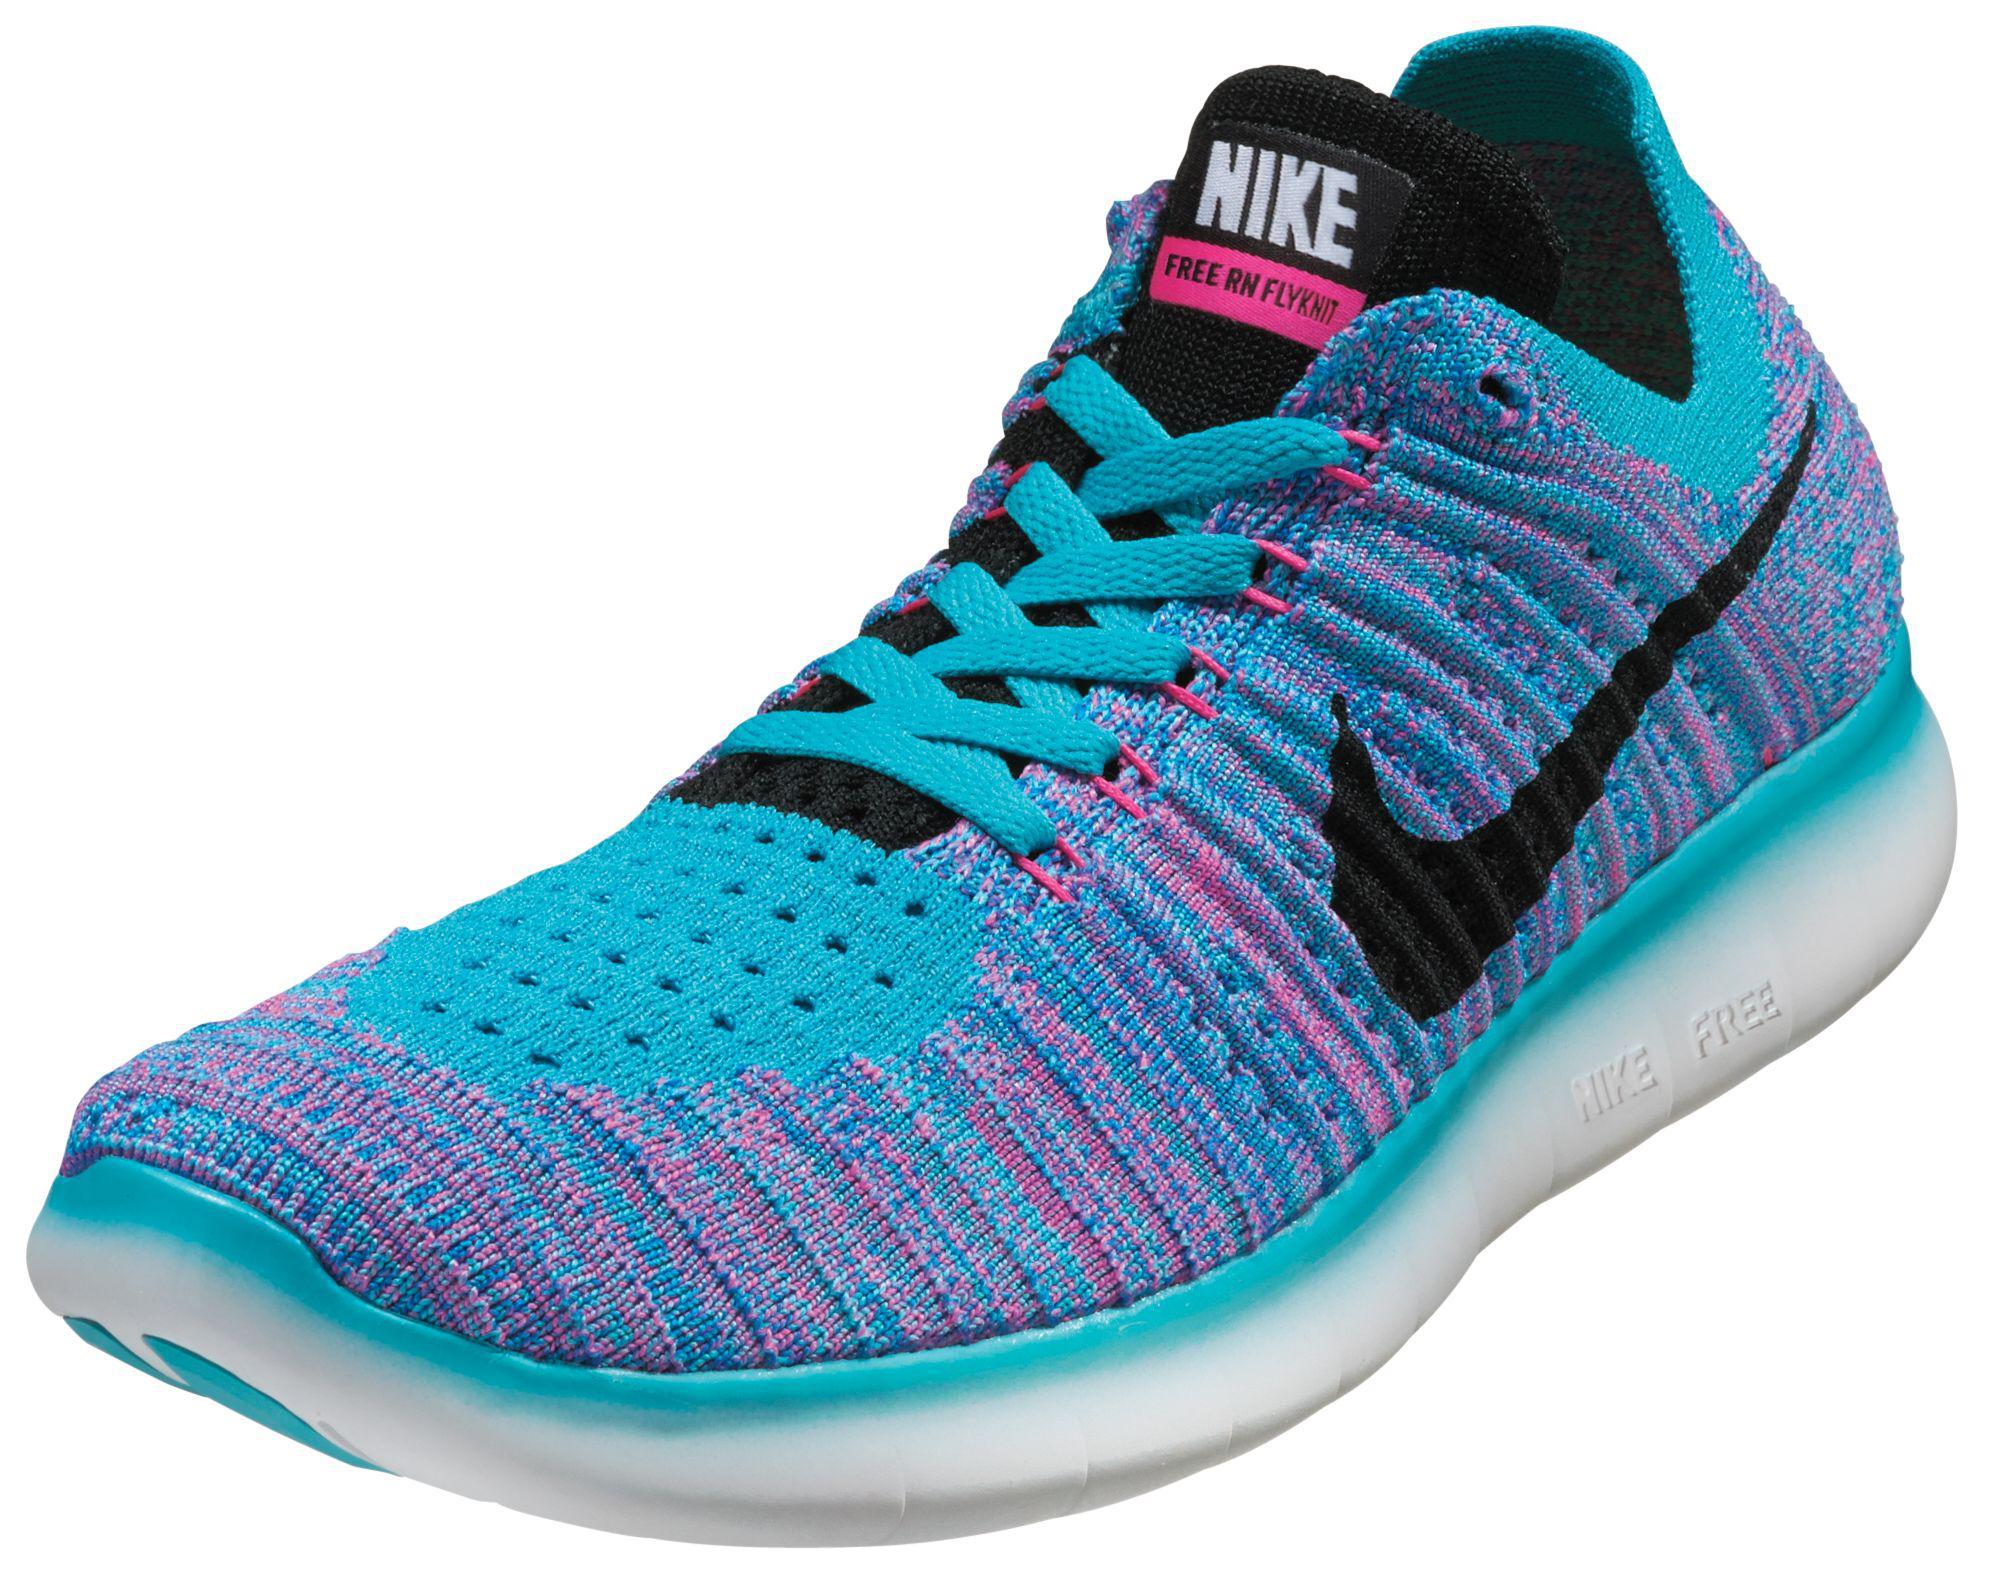 57fea5be814b Lyst - Nike Free Rn Flyknit Running Shoes in Blue for Men